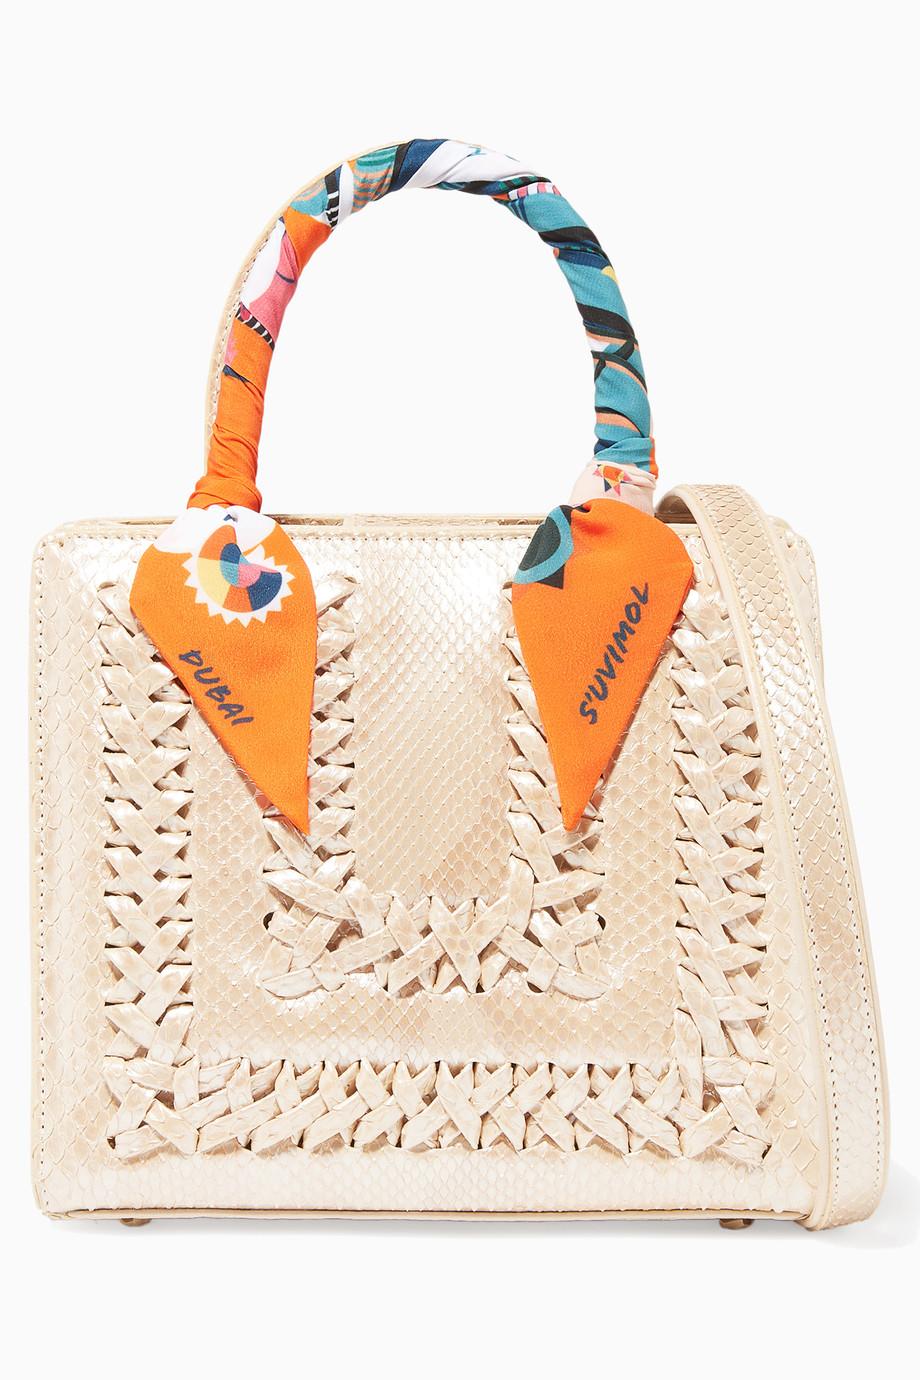 ed0f2265ee891 تسوق حقيبة ميني سويت صندوقية جلد افعى بيضاء ثلجية S uvimol لون طبيعى للنساء